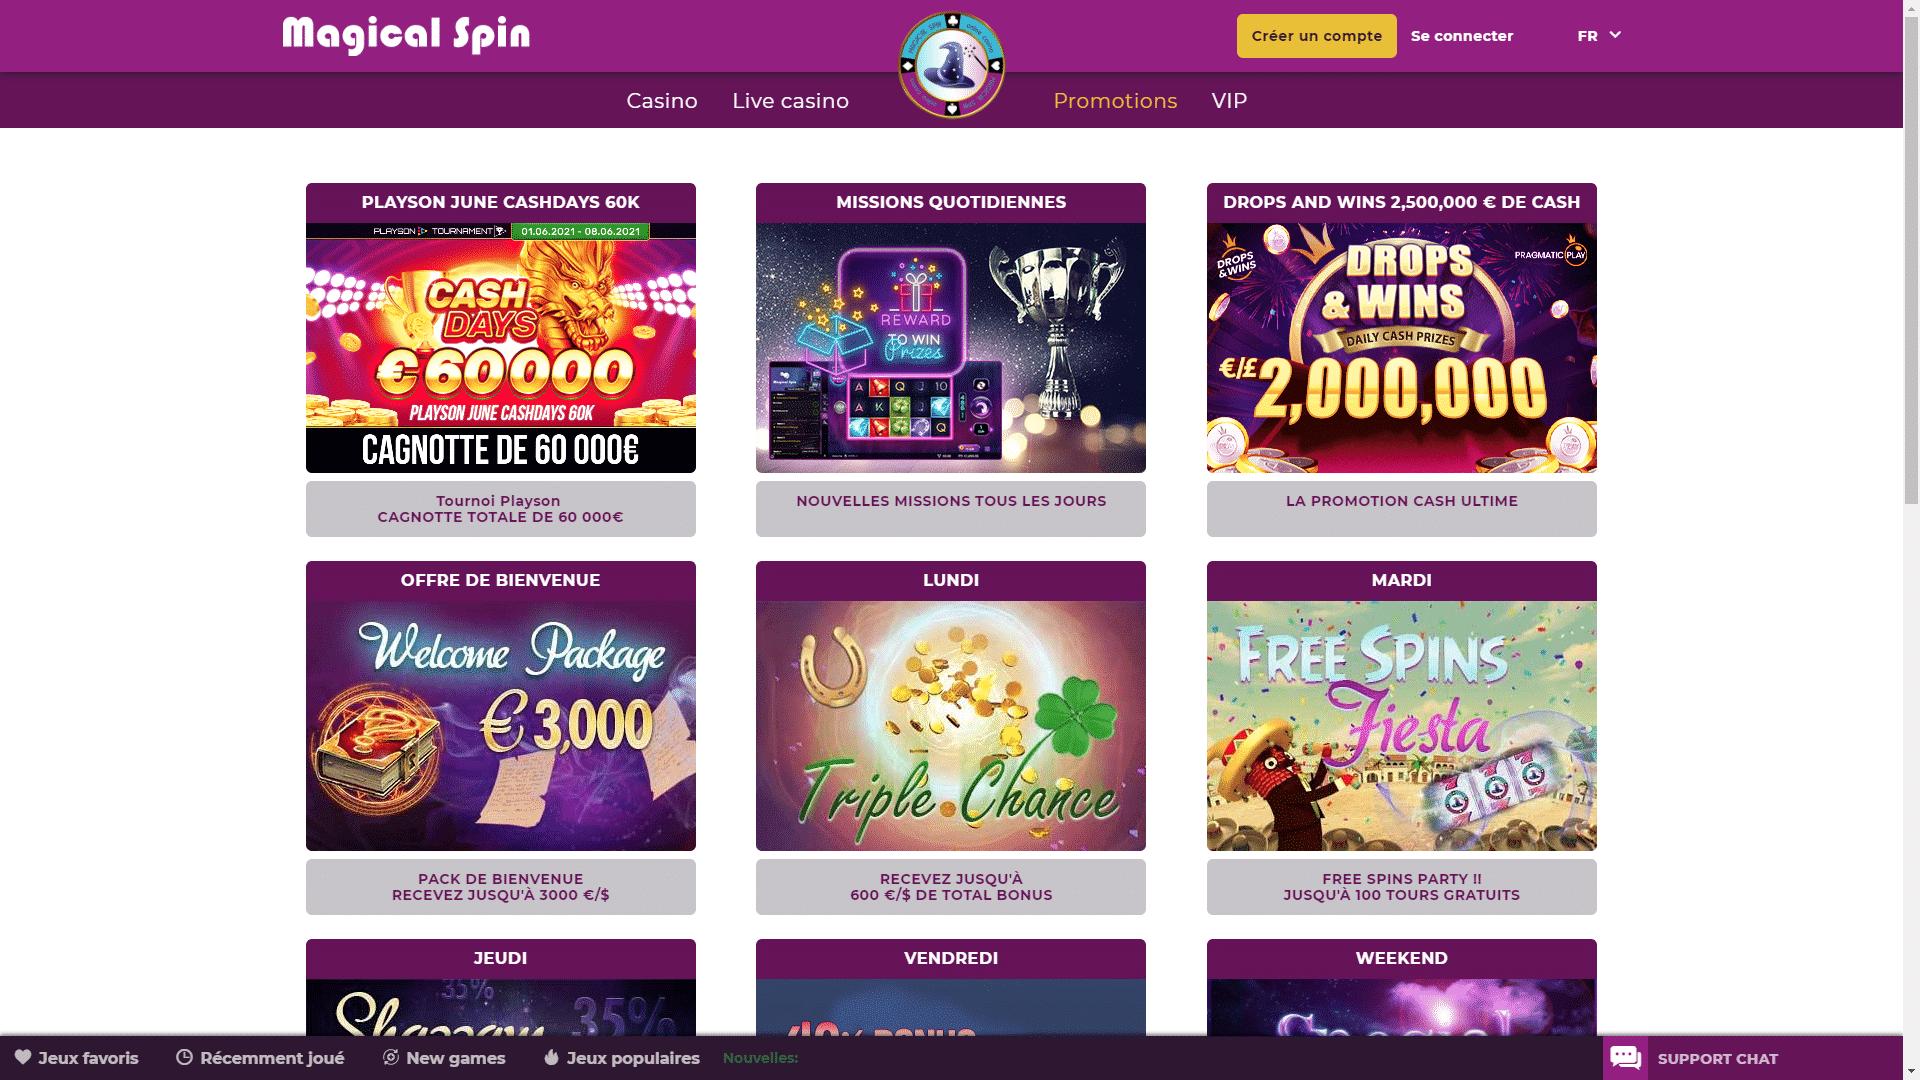 magical spin avis casino